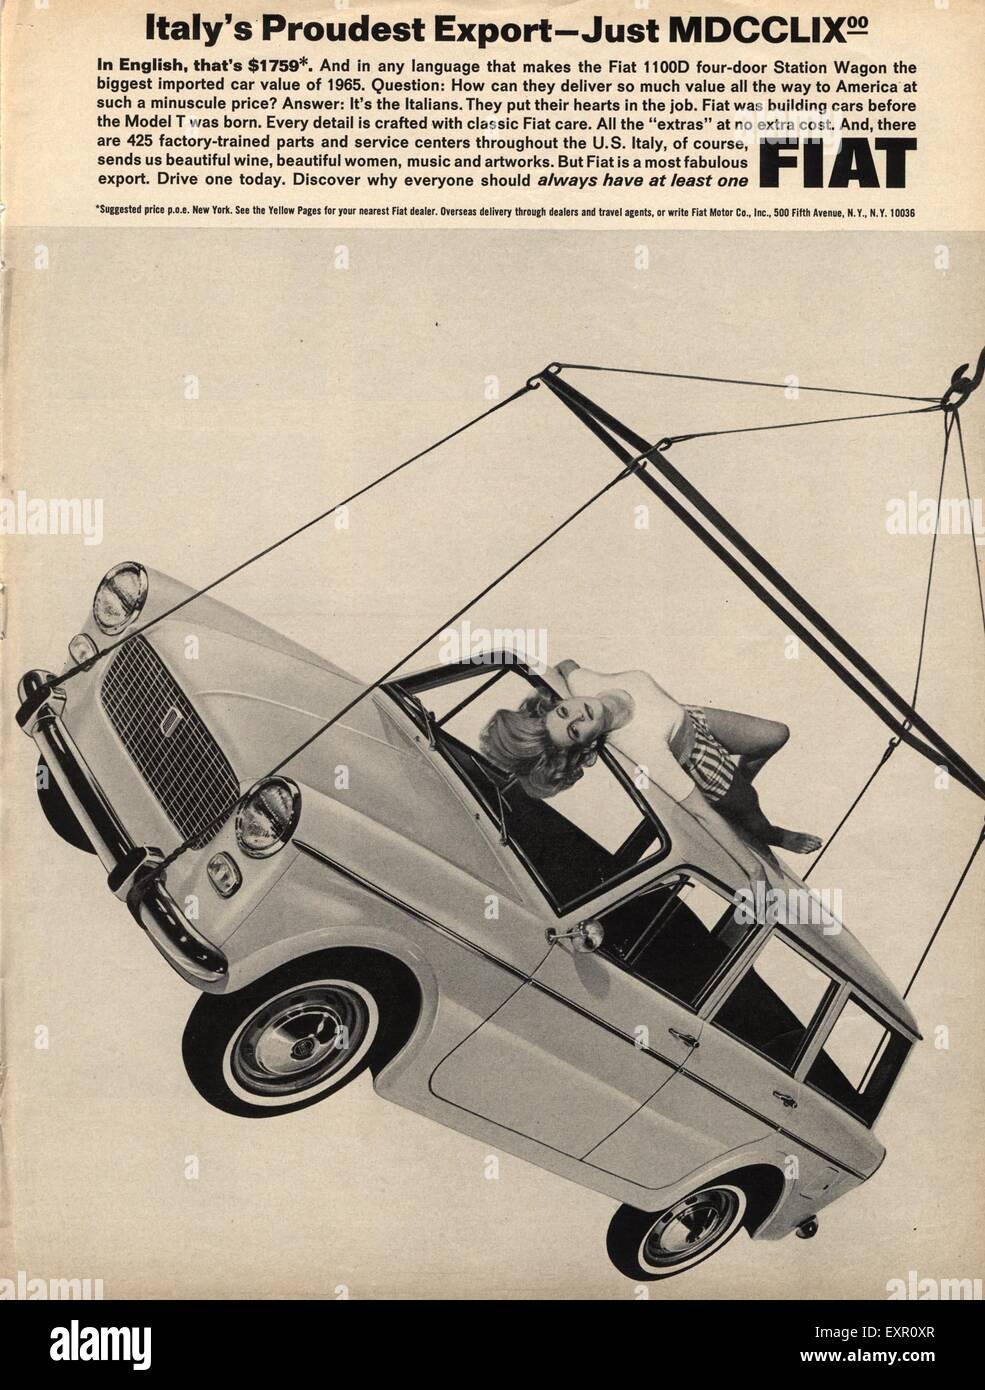 S USA Fiat Magazine Advert Stock Photo Royalty Free Image - Nearest fiat dealer